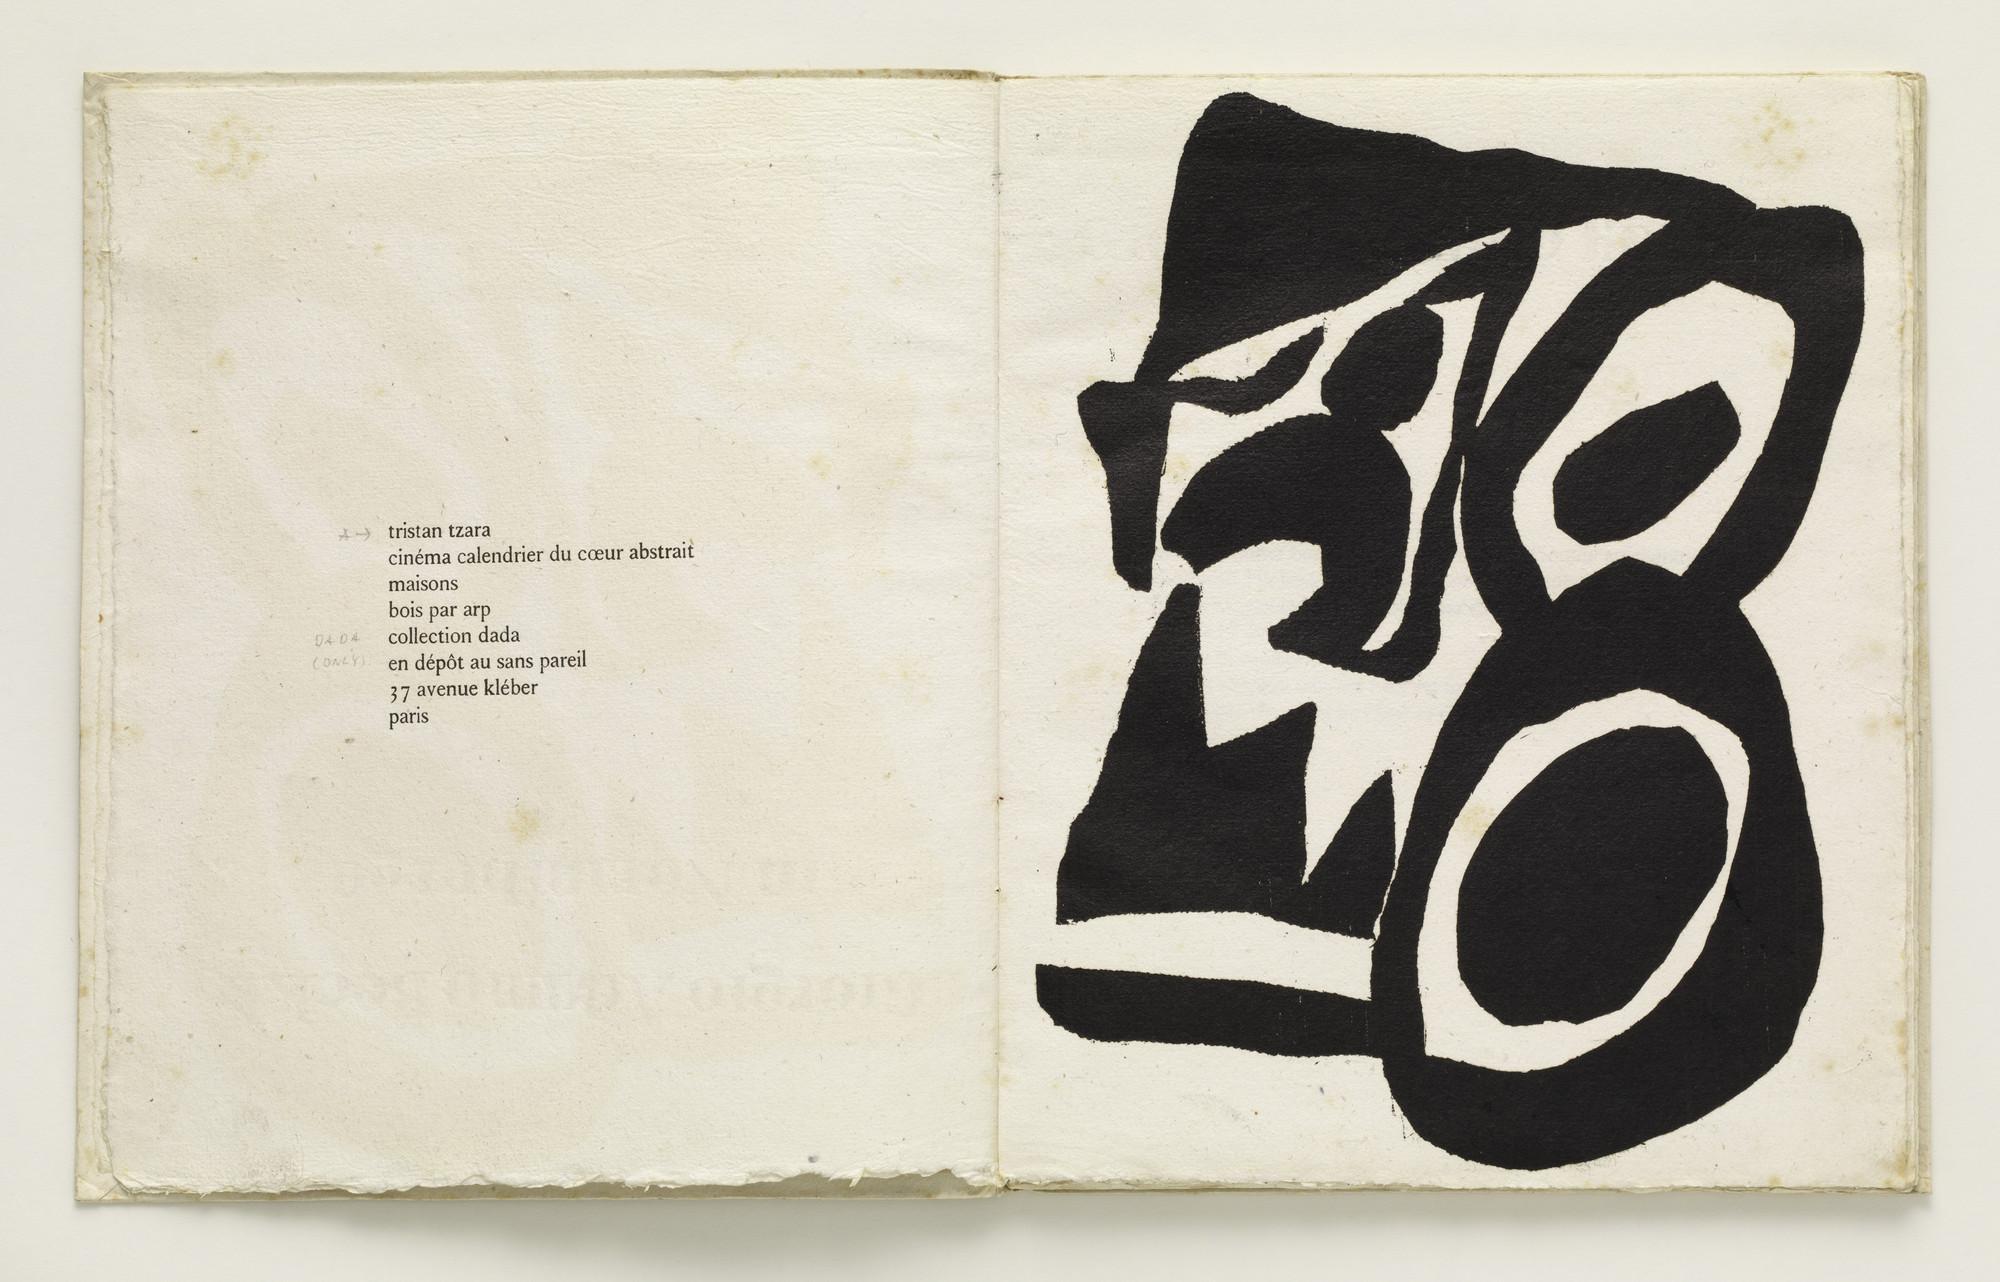 Illustration Calendrier.Jean Hans Arp Cinema Calendrier Du Coeur Abstrait